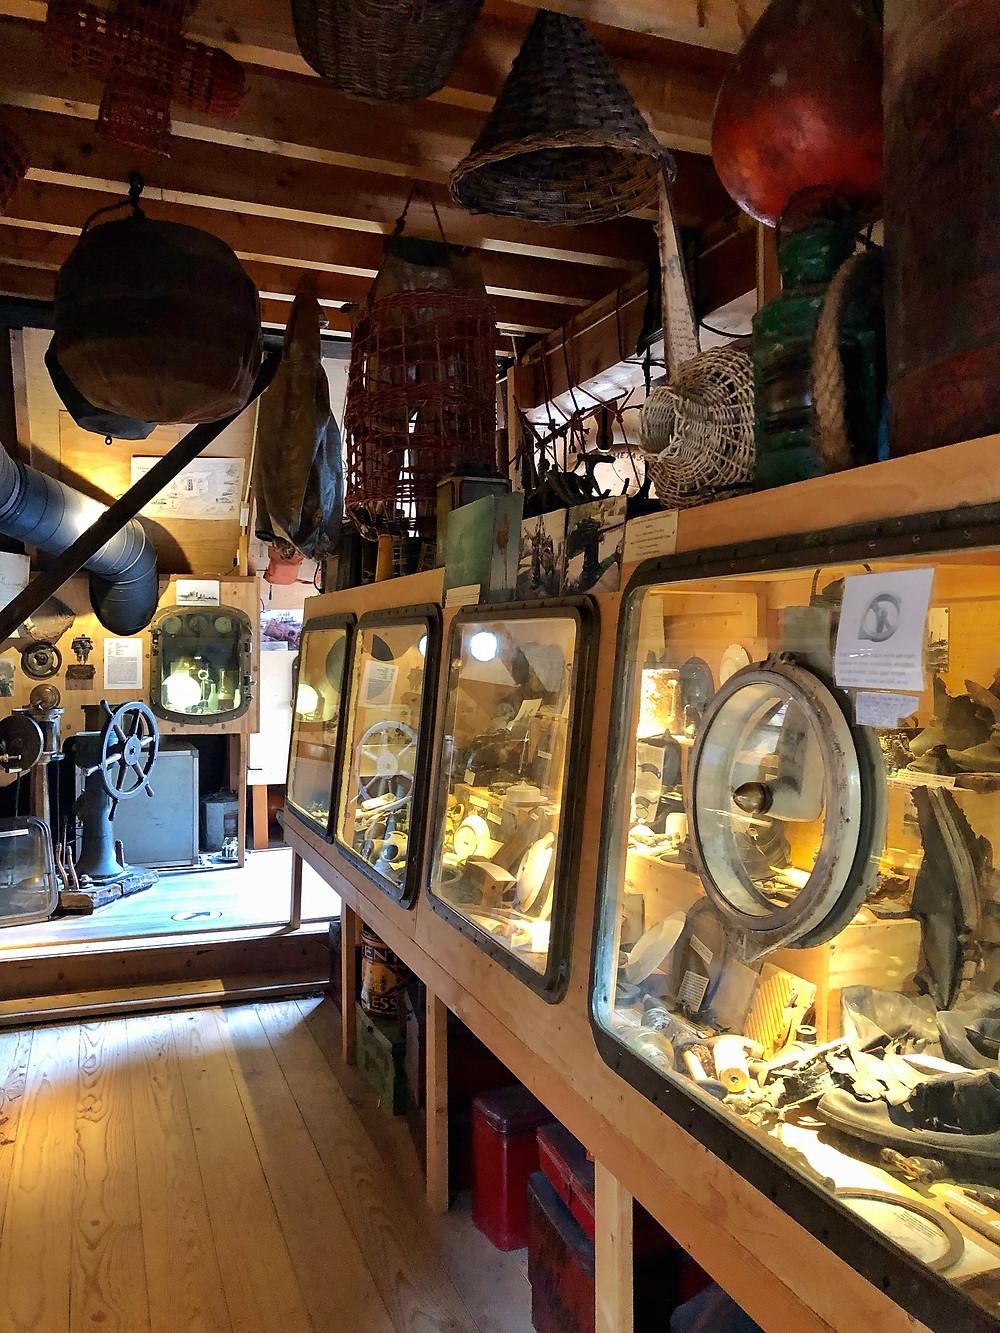 Shipwreck museum (wrakkenmuseum) Terschelling